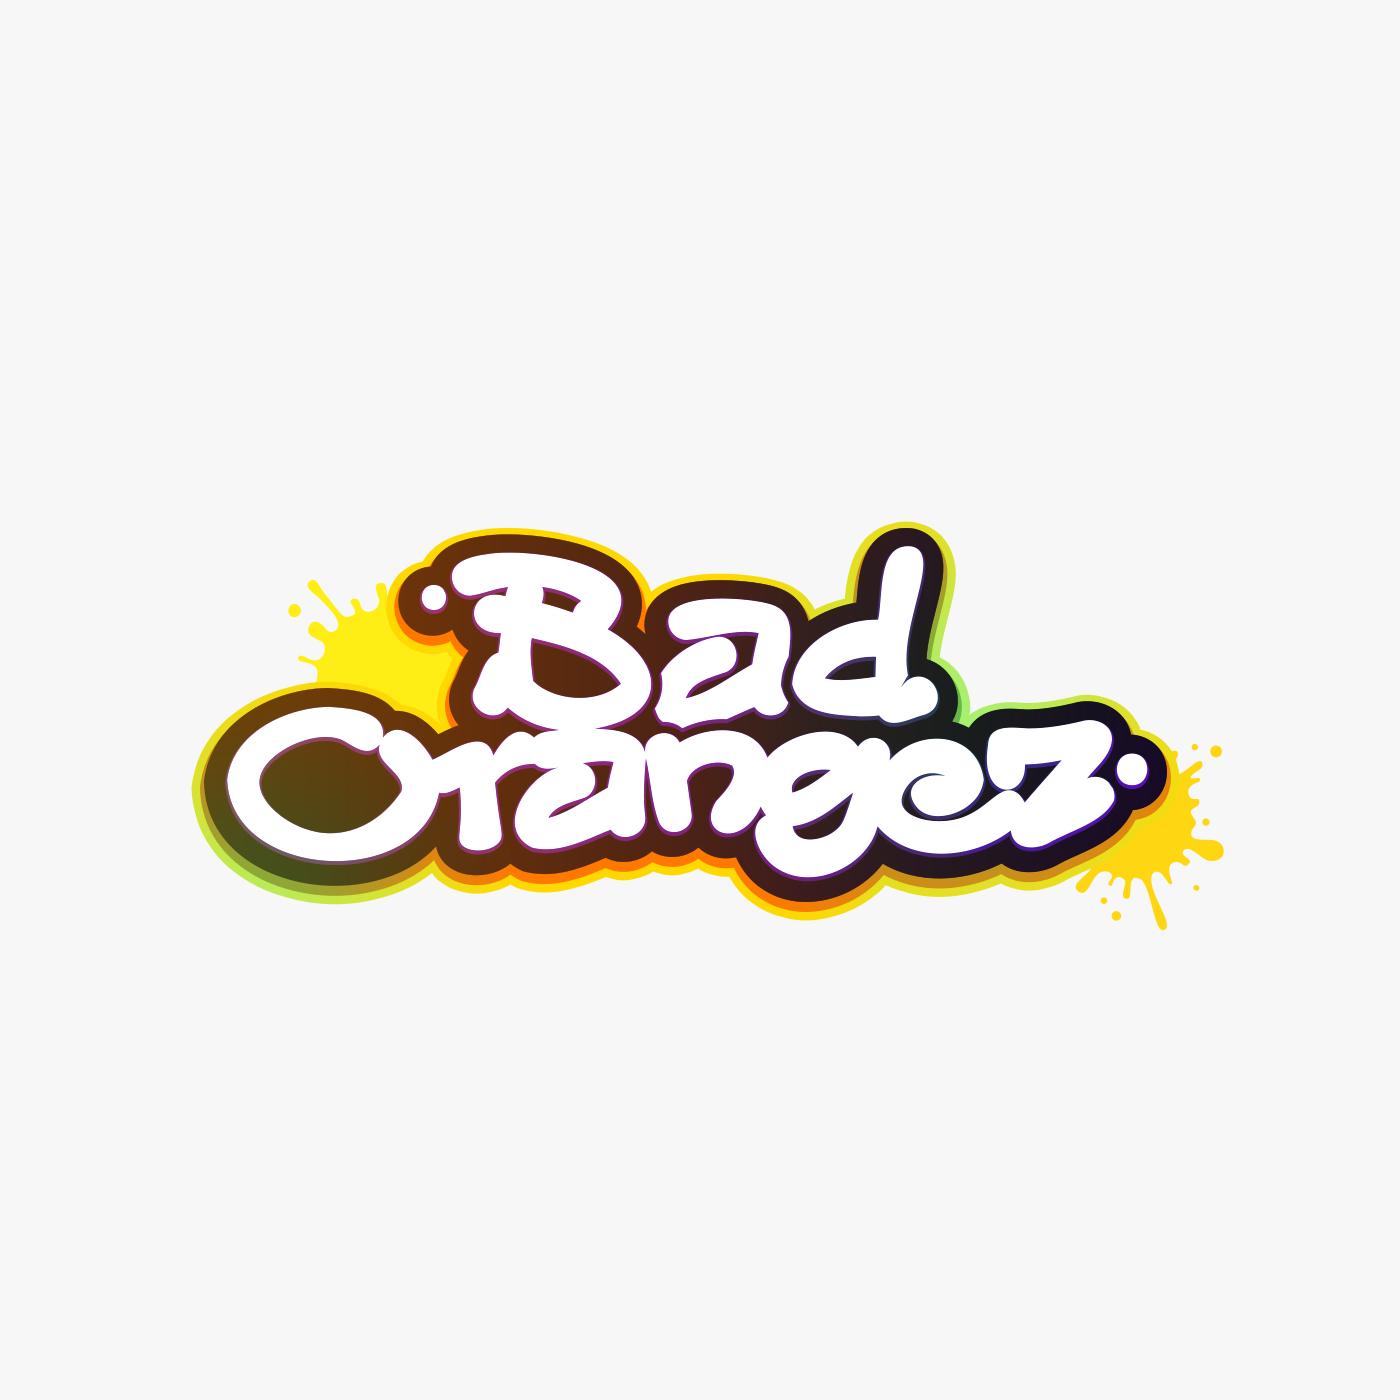 Bad Orangez